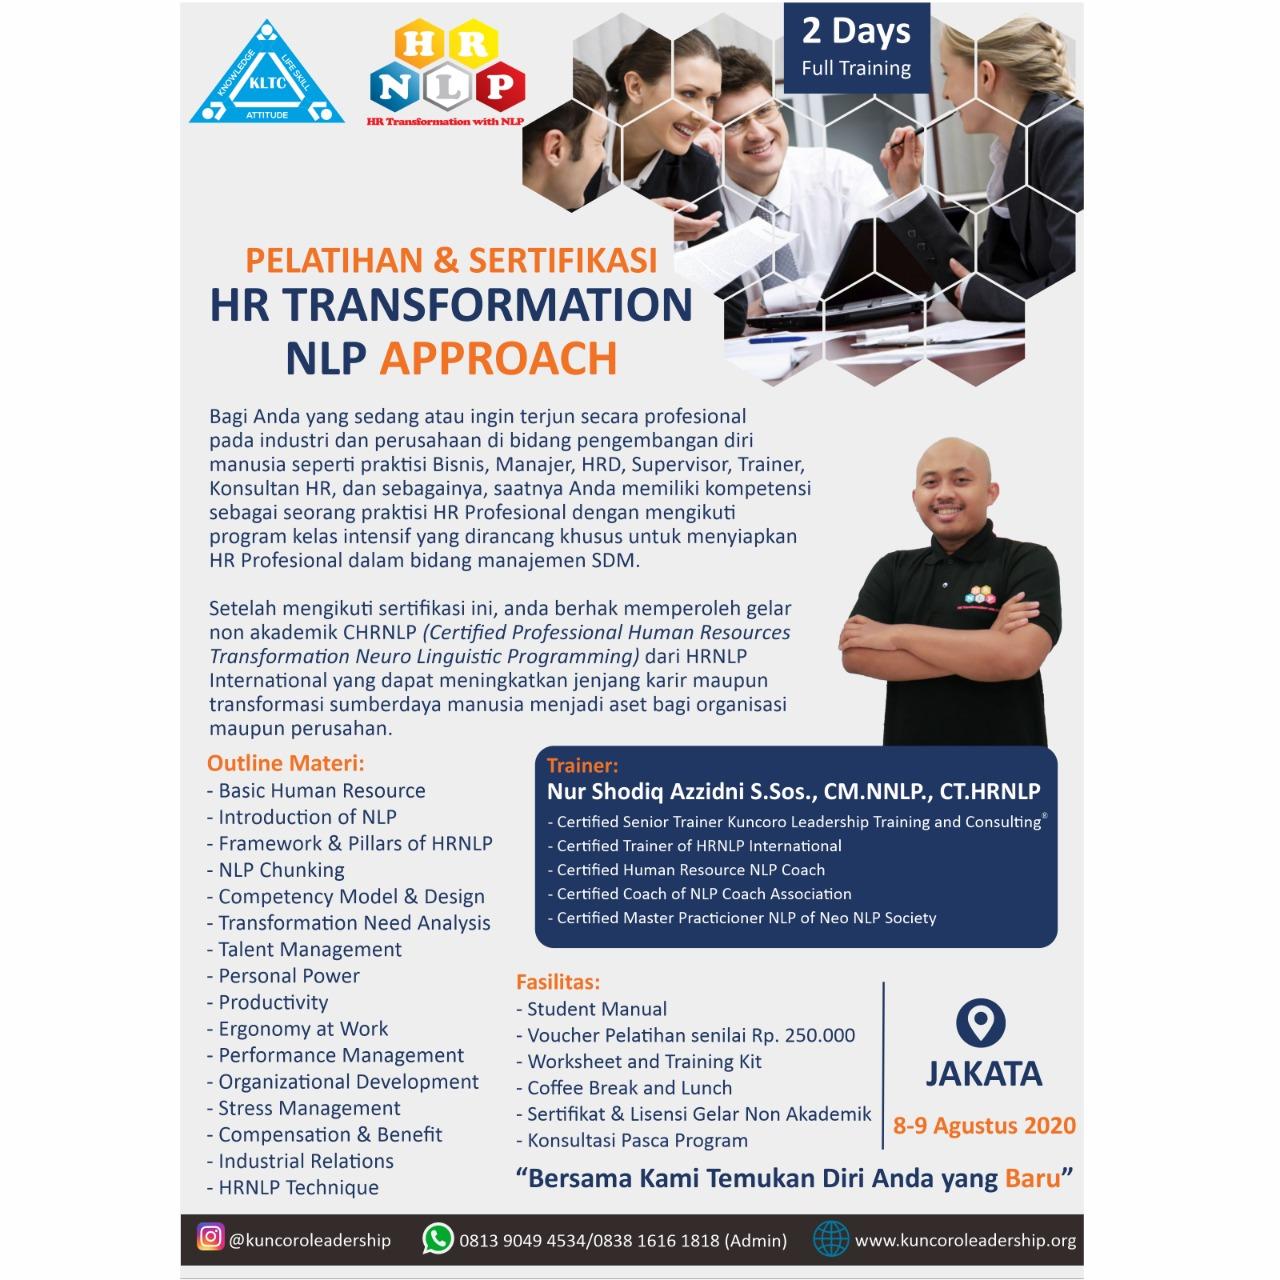 PROGRAM PELATIHAN DAN SERTIFIKASI HR TRANSFORMATION NLP APPROACH